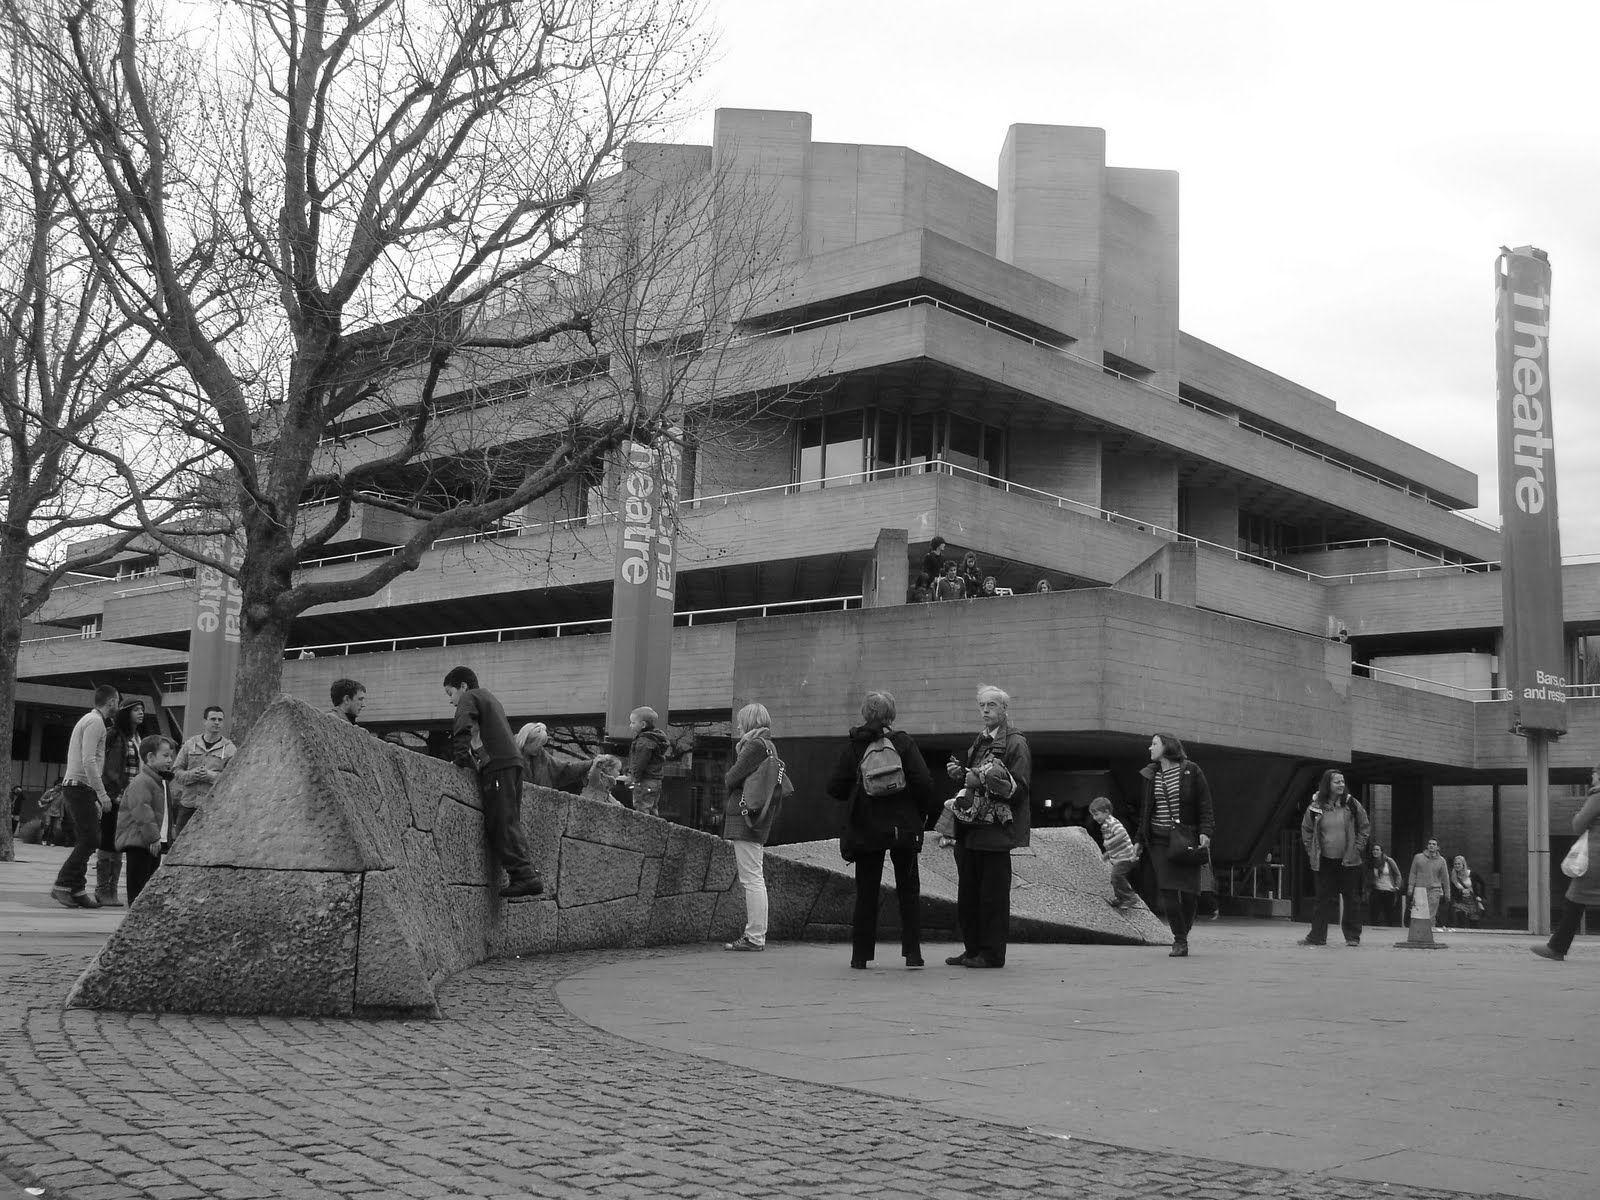 The National Theatre, London, 1967-1976. Architect: Denys Lasdun